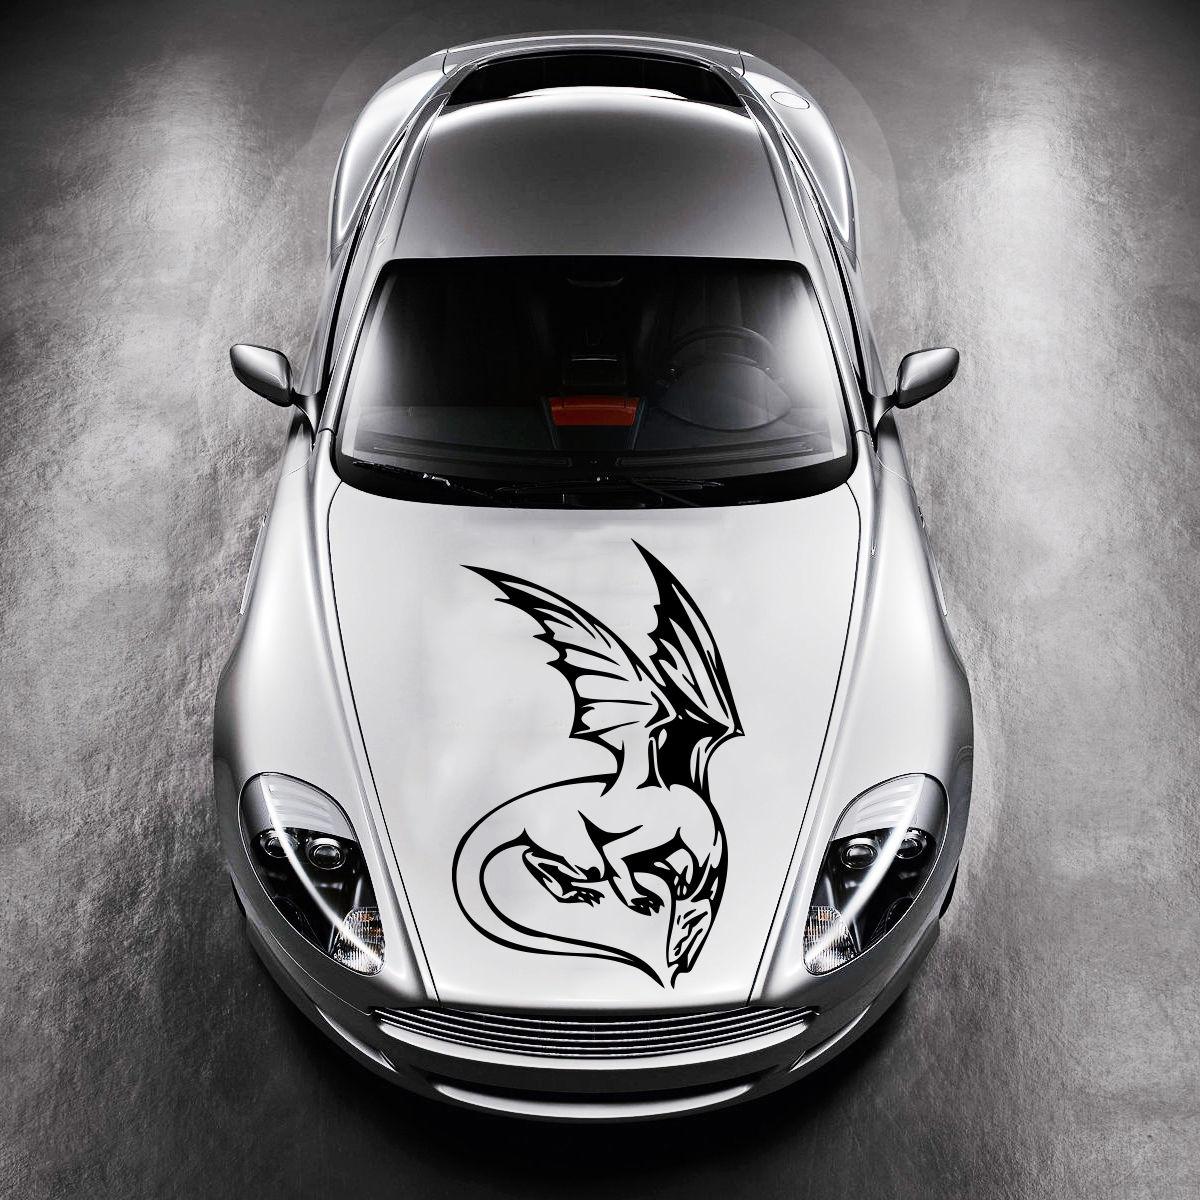 Car visor sticker designs - Car Hood Vinyl Sticker Decals Graphics Design Art Dragon Animal Tattoo Sv4870 China Mainland